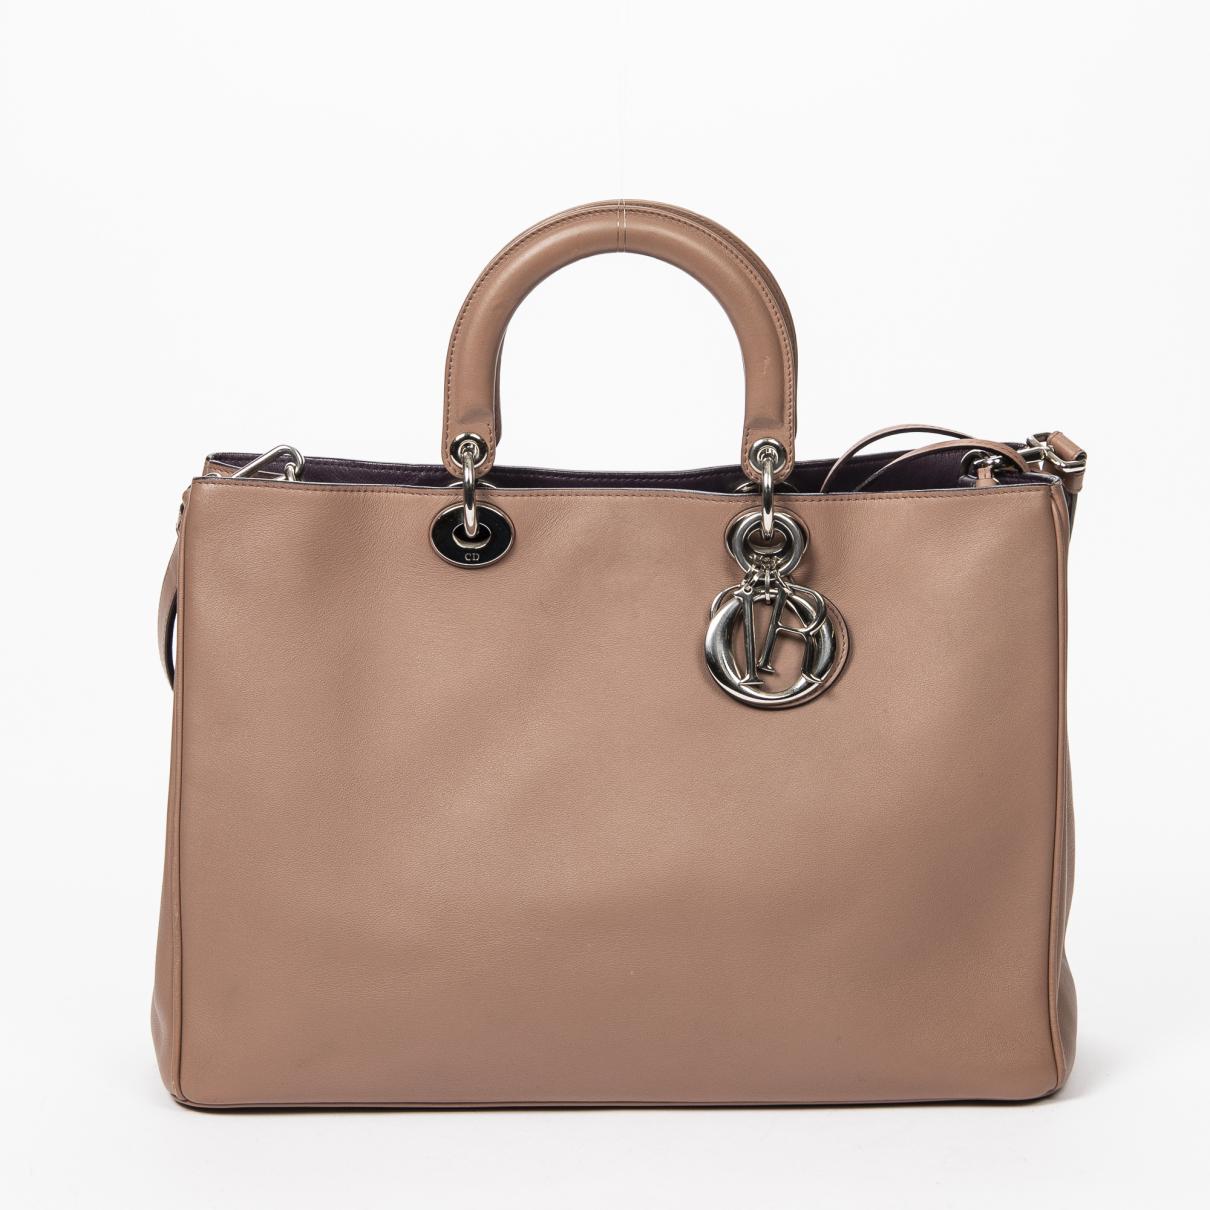 Dior \N Handtasche in  Beige Leder